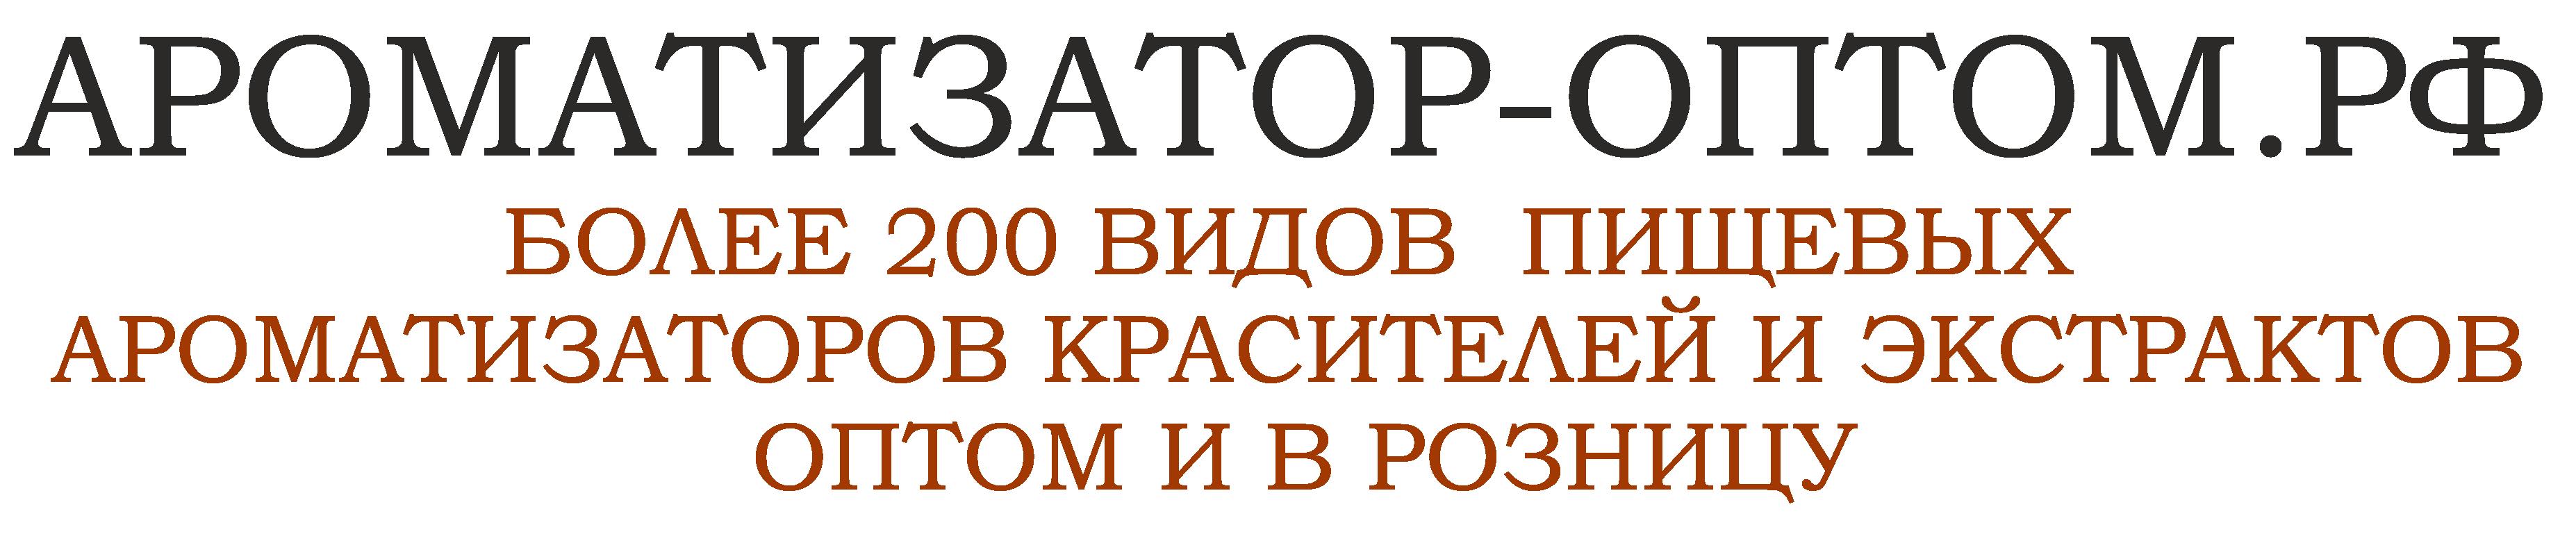 Ароматизатор-Оптом.рф